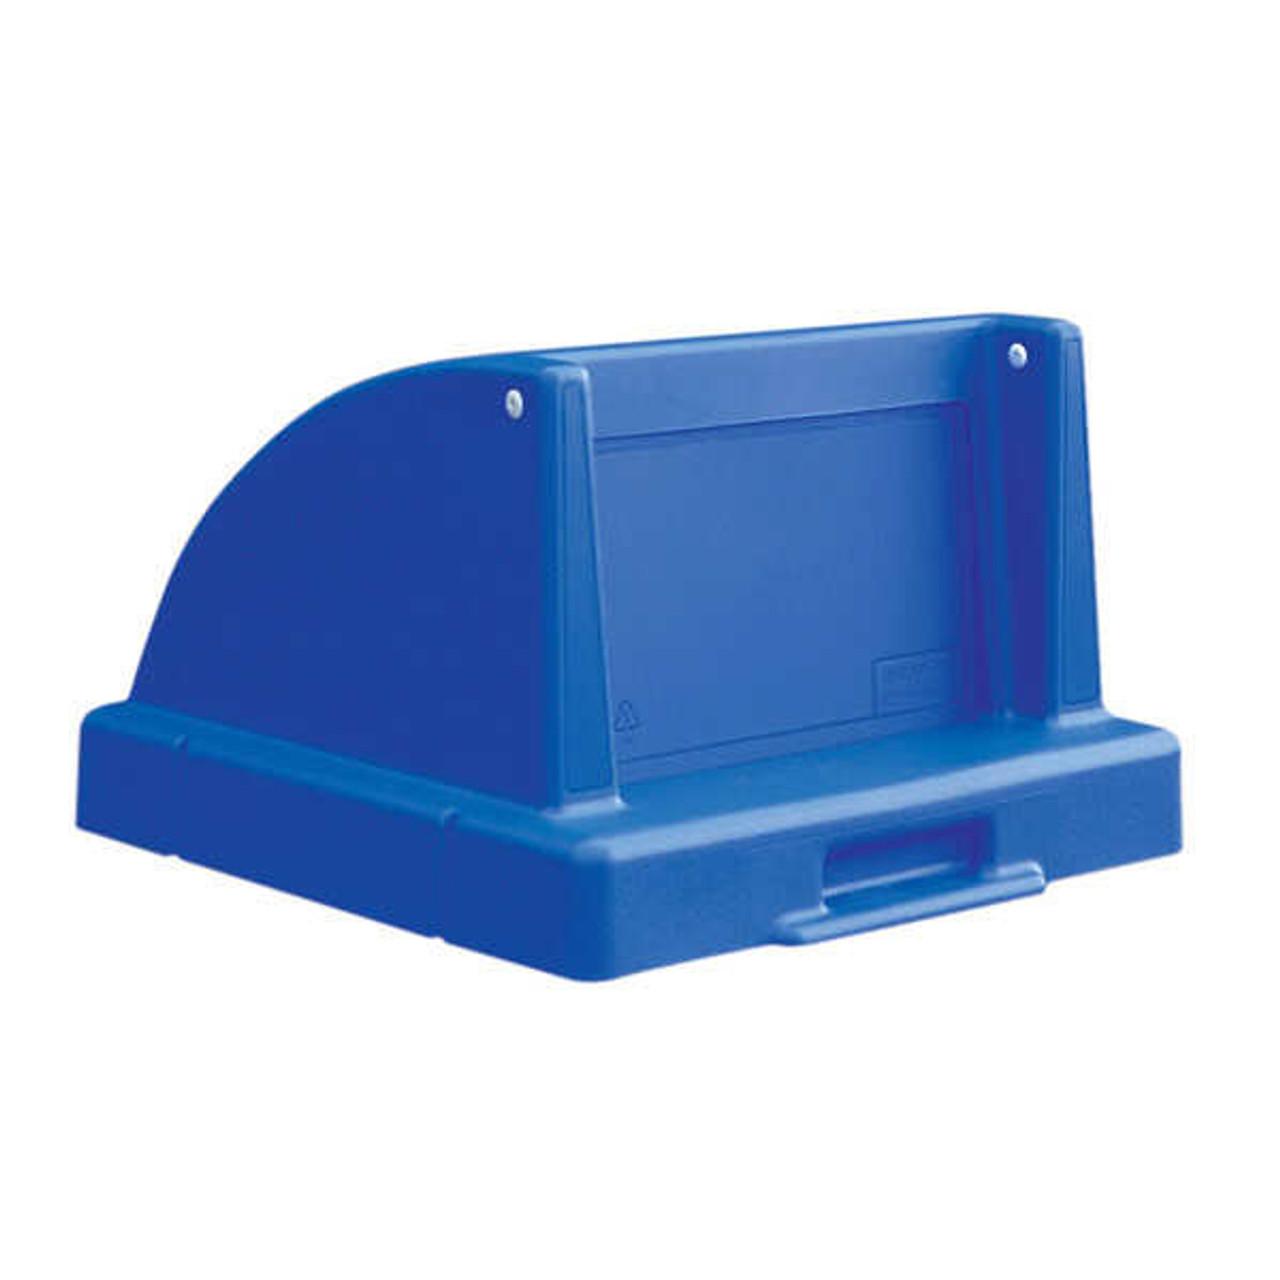 20.5 x 20.5 Push Door Plastic Lids TF1405QS for Square Trash Cans Blue